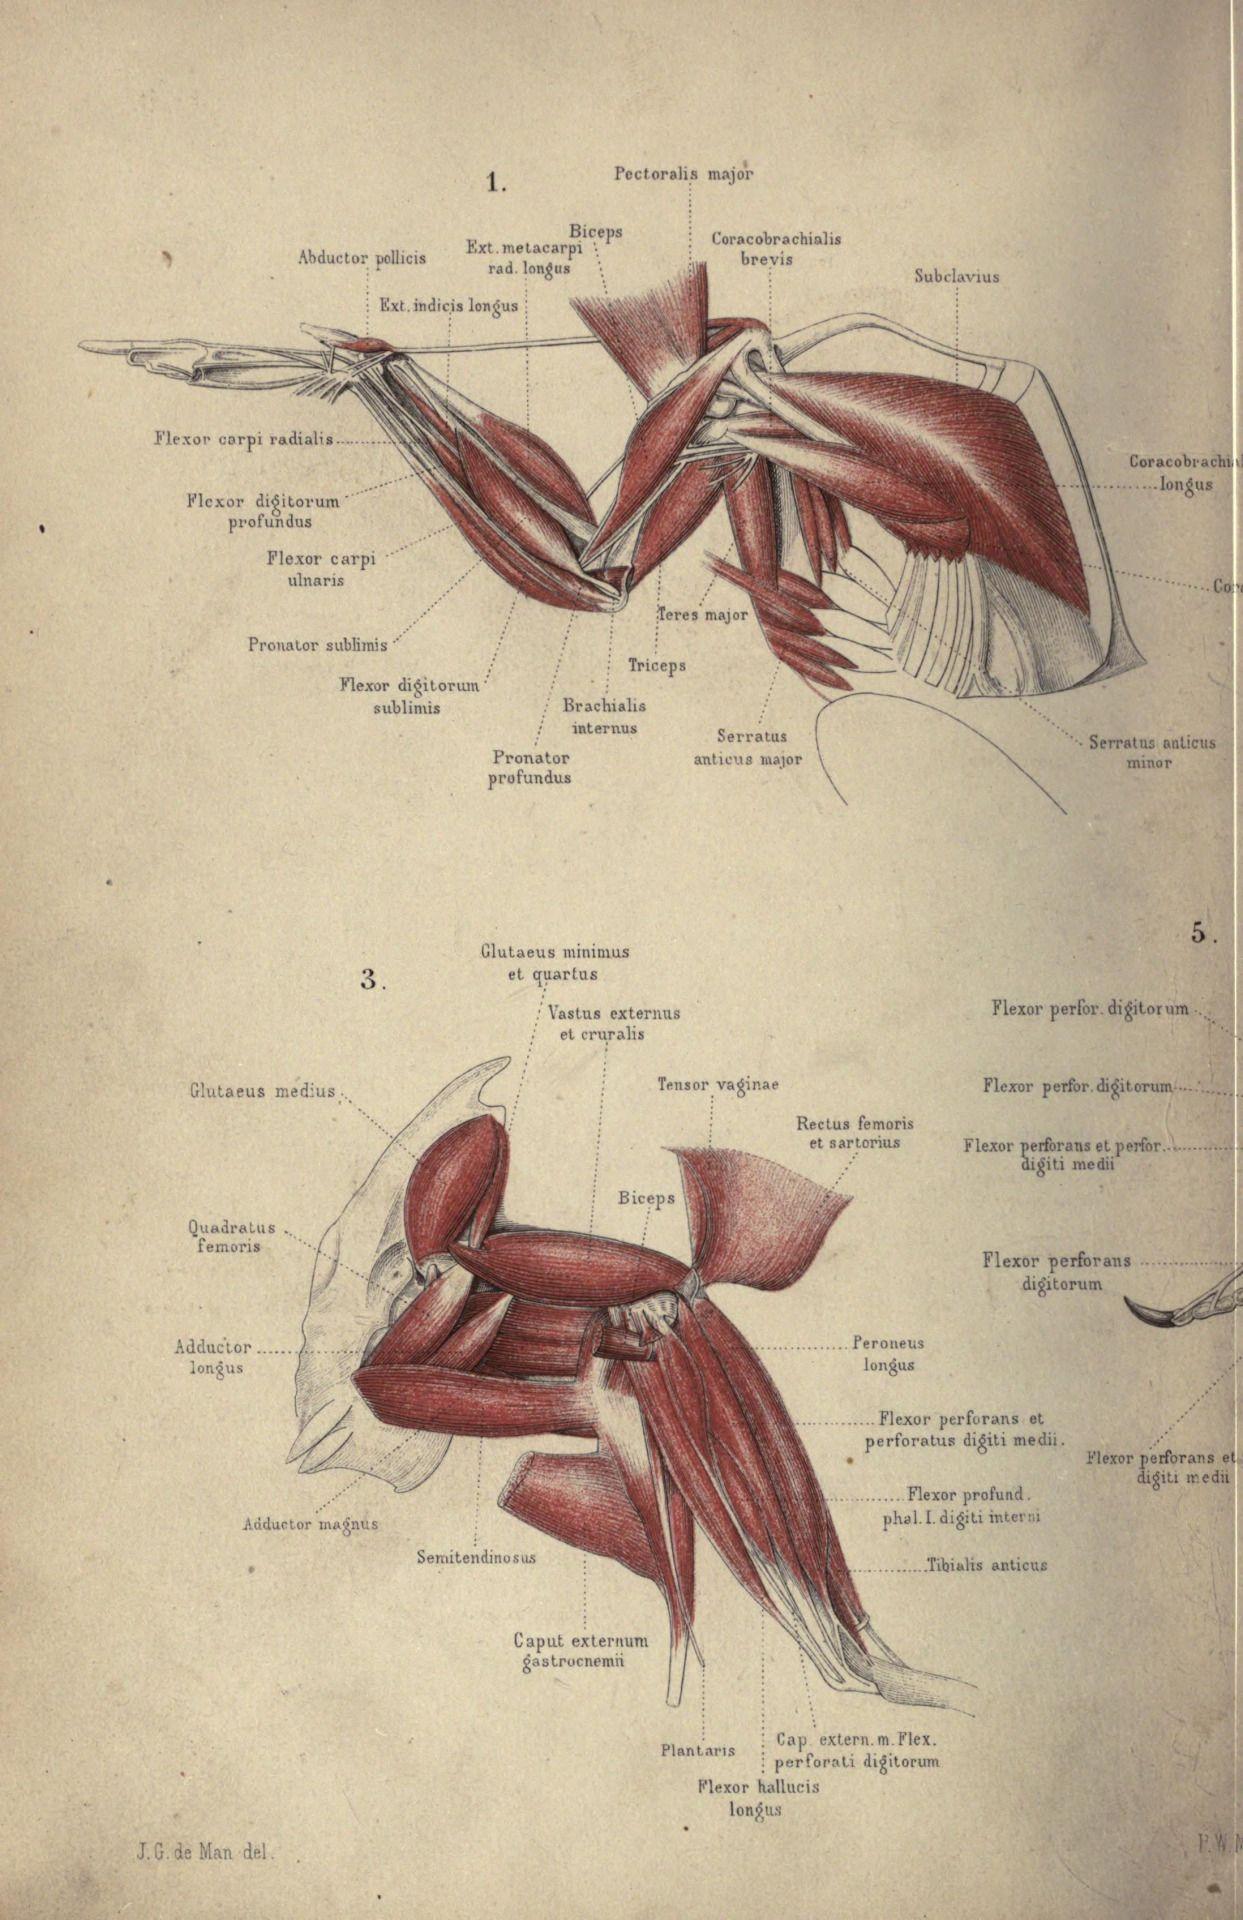 Avian Anatomy Diagram Labeled S13 240sx Headlight Wiring Bird Wing Muscle Howstuffworks Pinterest